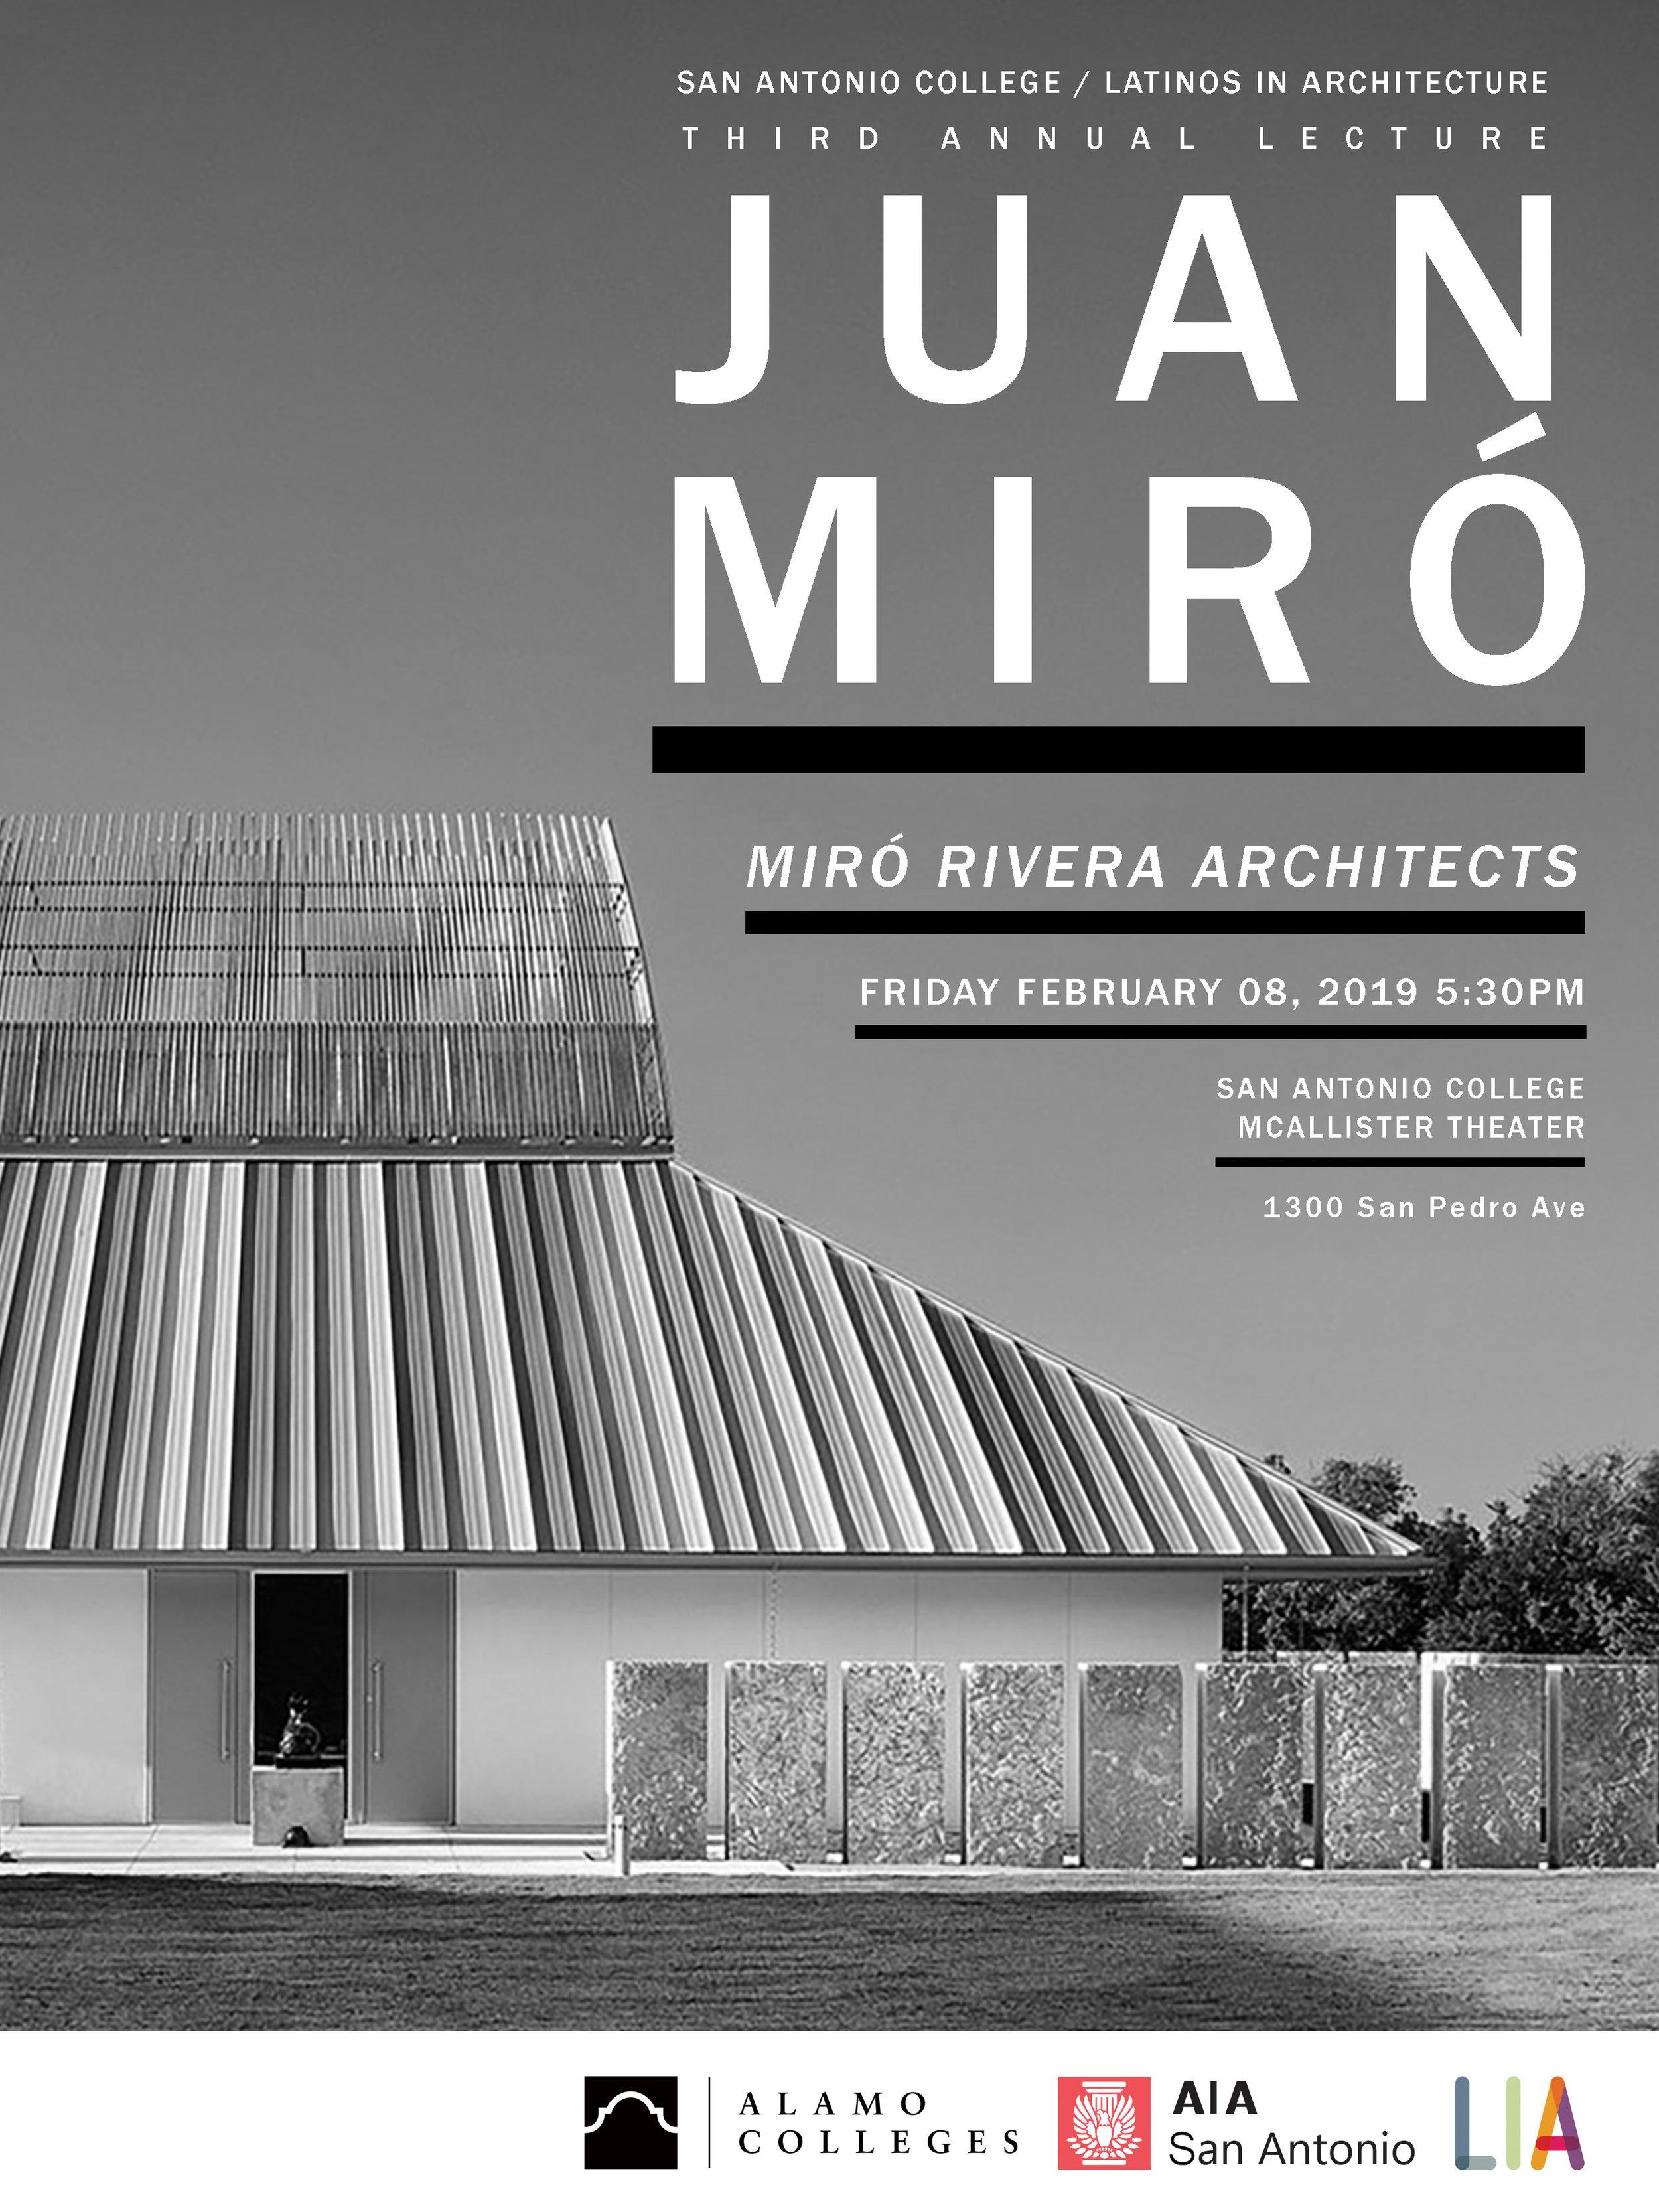 JuanMiro_Lecture.jpg